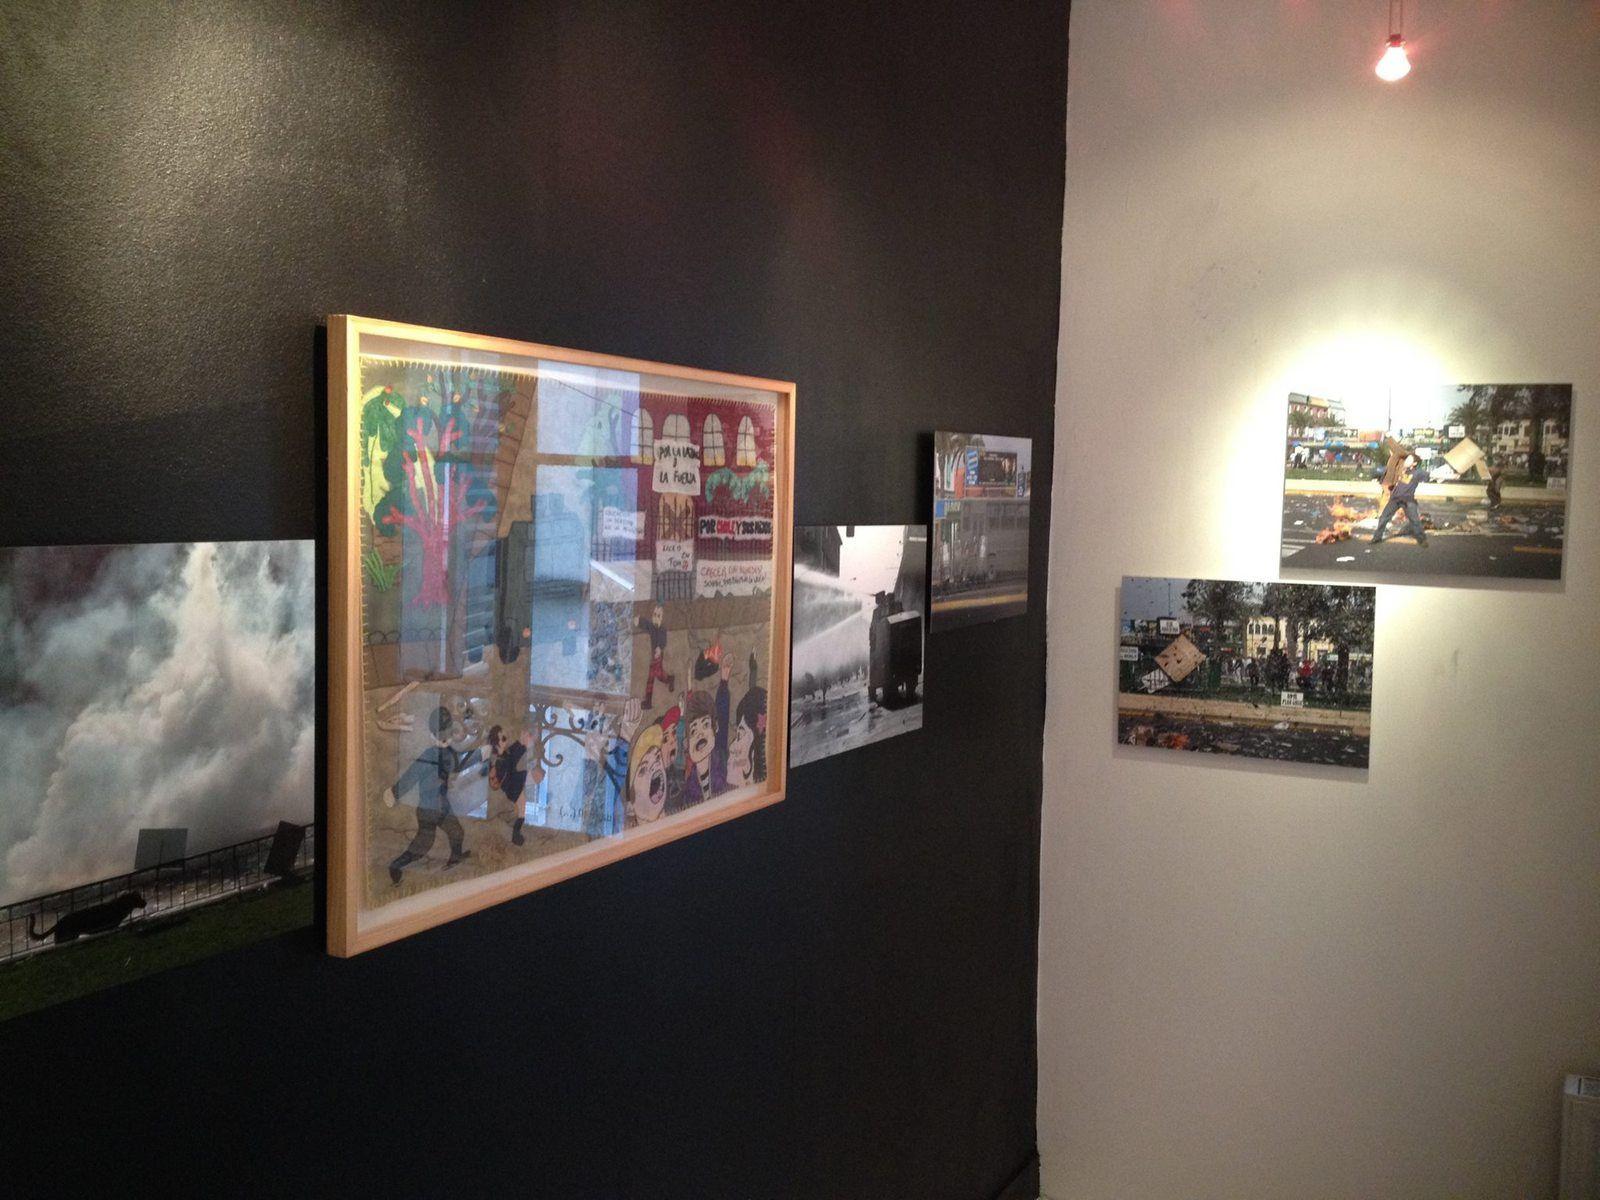 vues de l'exposition